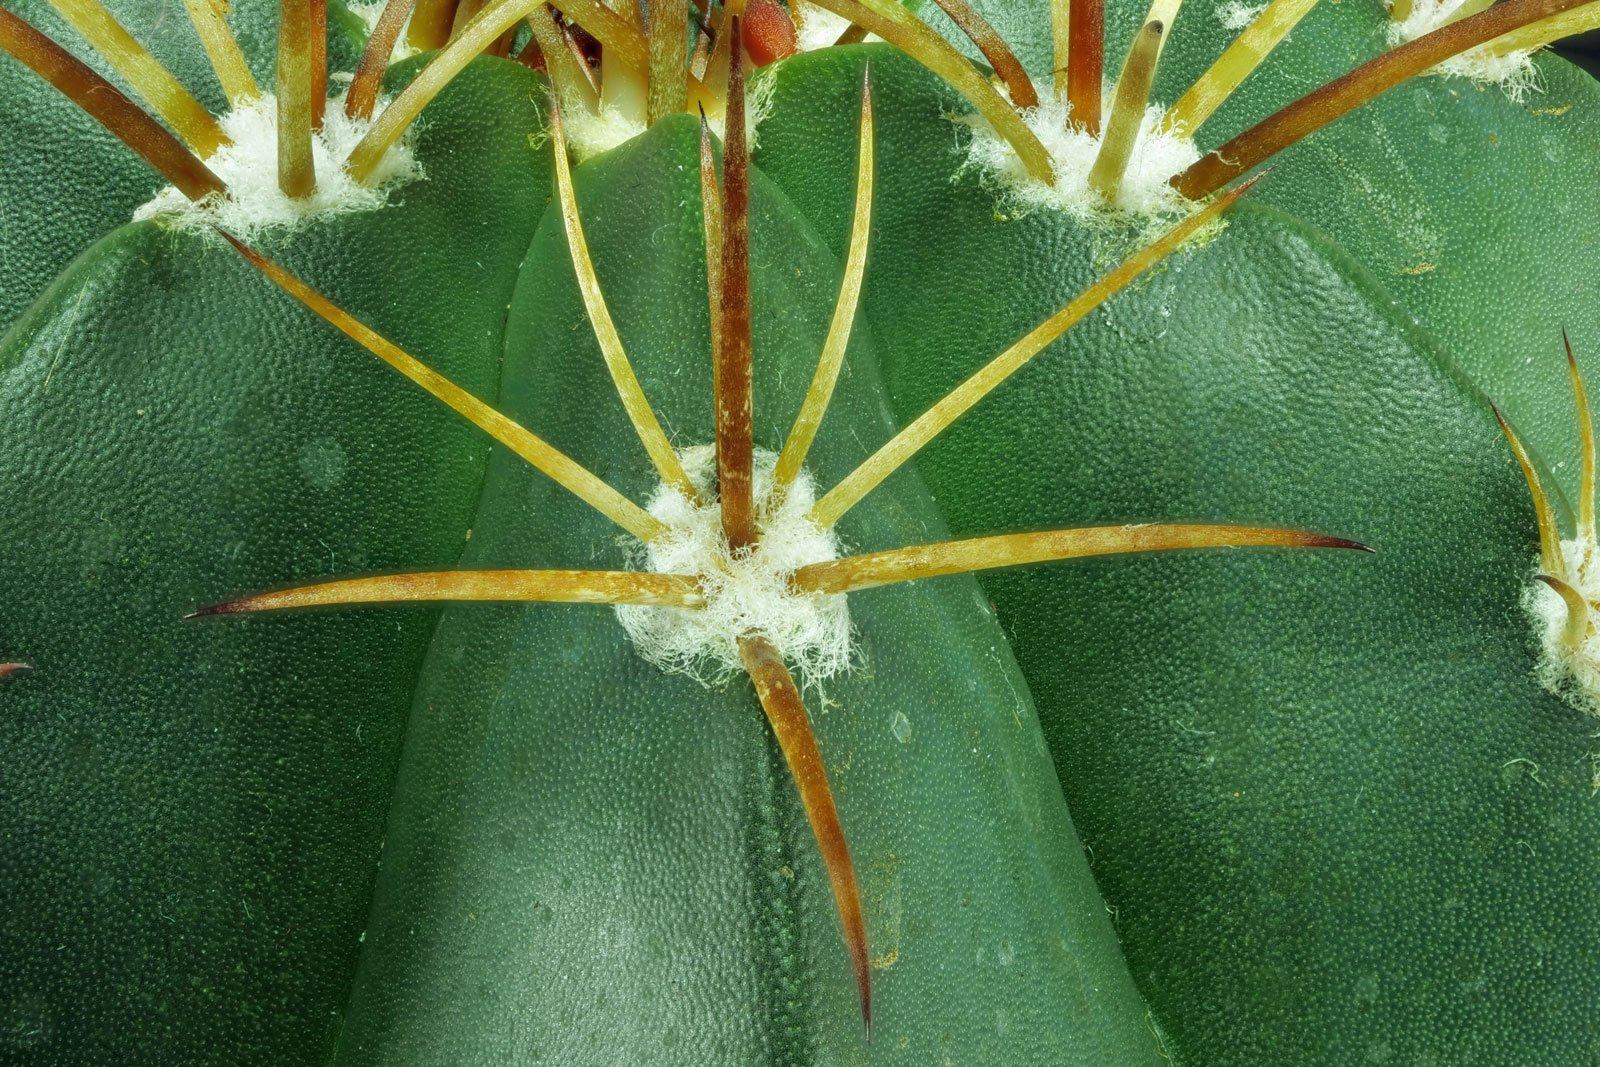 Melocactus bahiensis